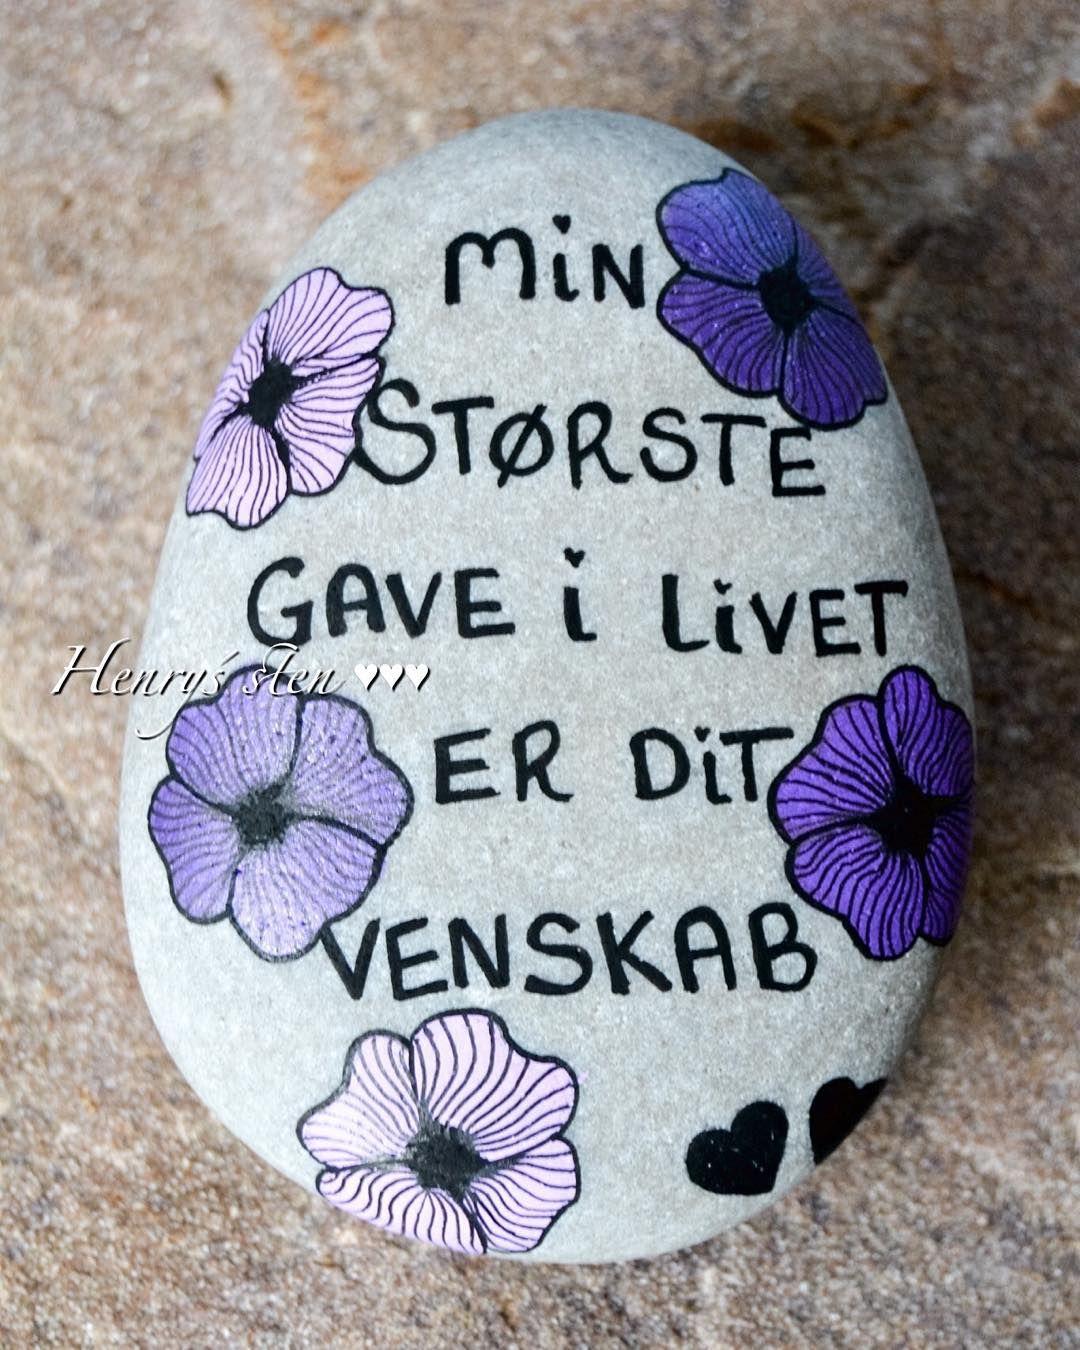 """#gave #venskab #livet #stone #stonernation #stonerlife #stonerdays #stones #stonesour #stonesourrocks #håndlavet #handpainted #loveit #flowers #hobby…"""